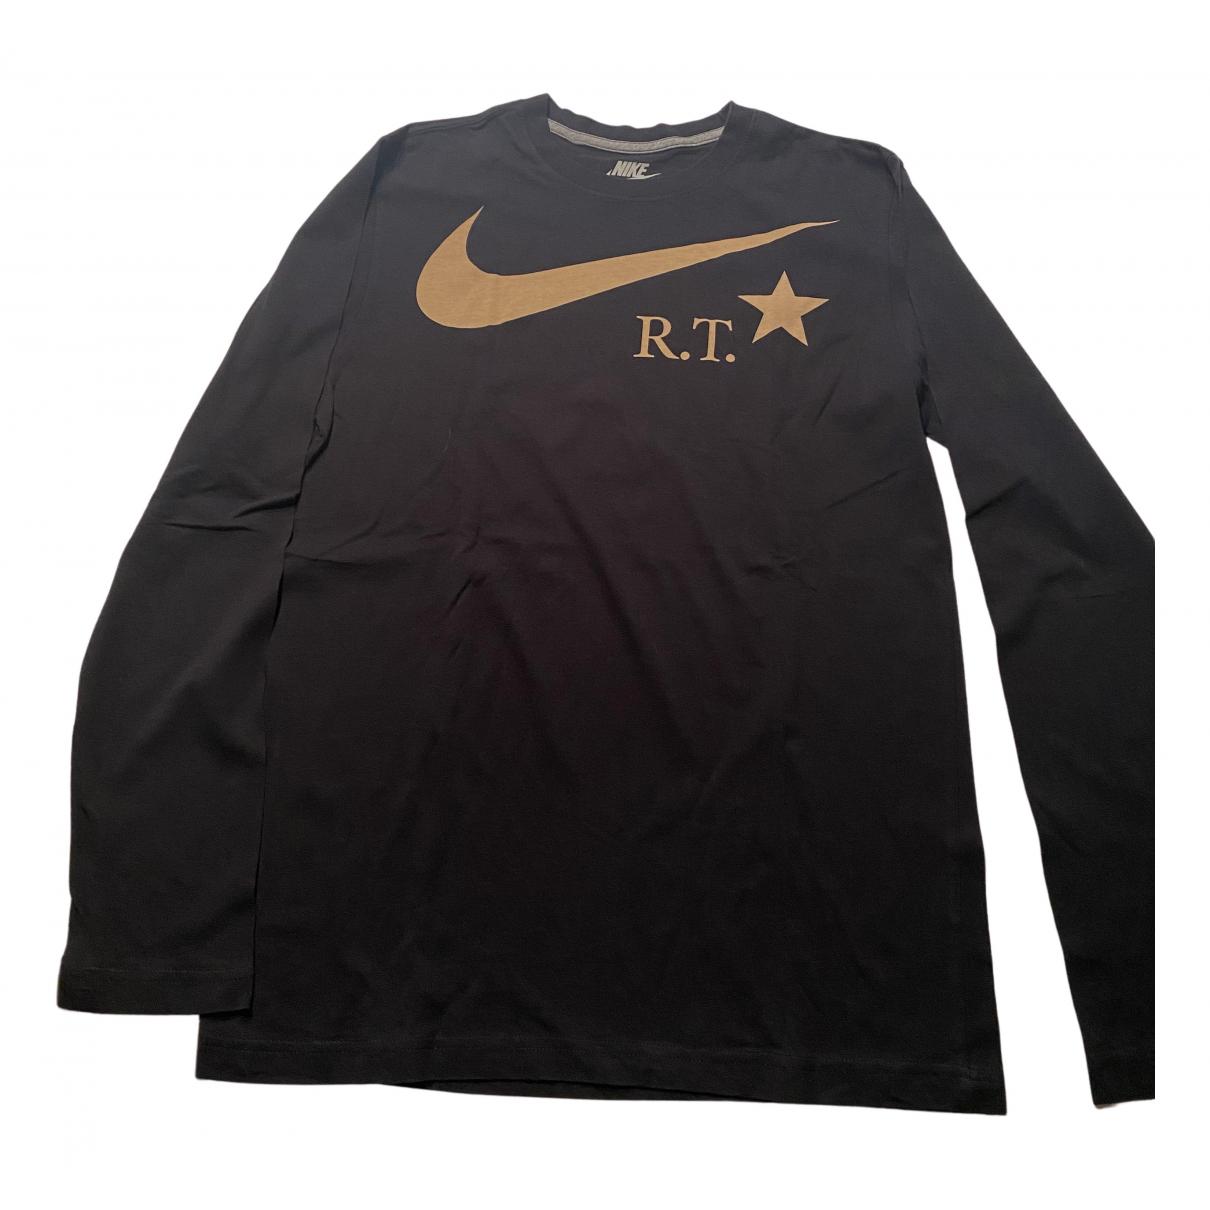 Nike By Riccardo Tisci - Tee shirts   pour homme en coton - noir